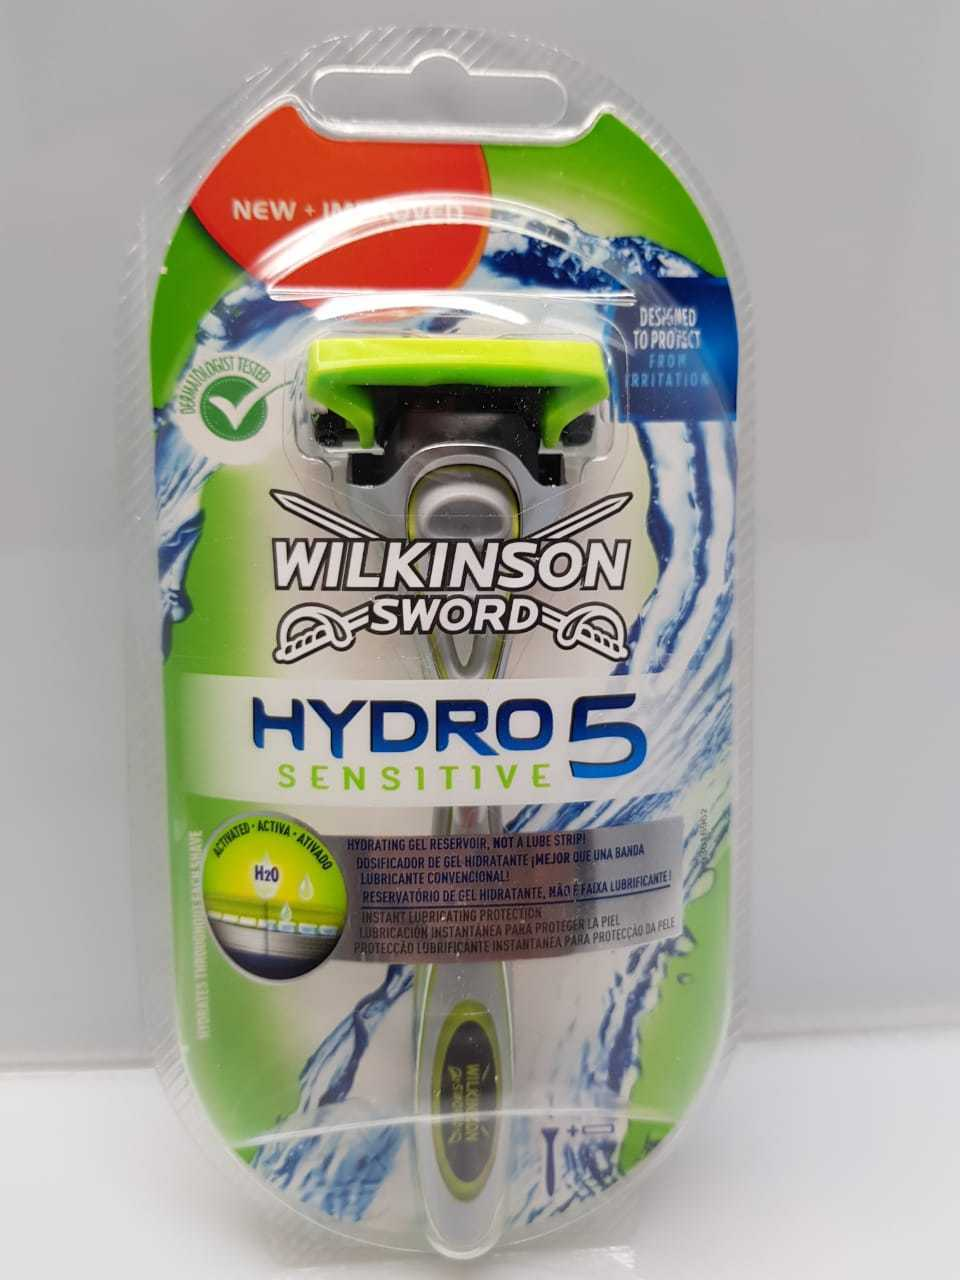 3 Wilkinson Sword Hydro 5 Sensitive  Klingen  + Rasierer NEW+OVP